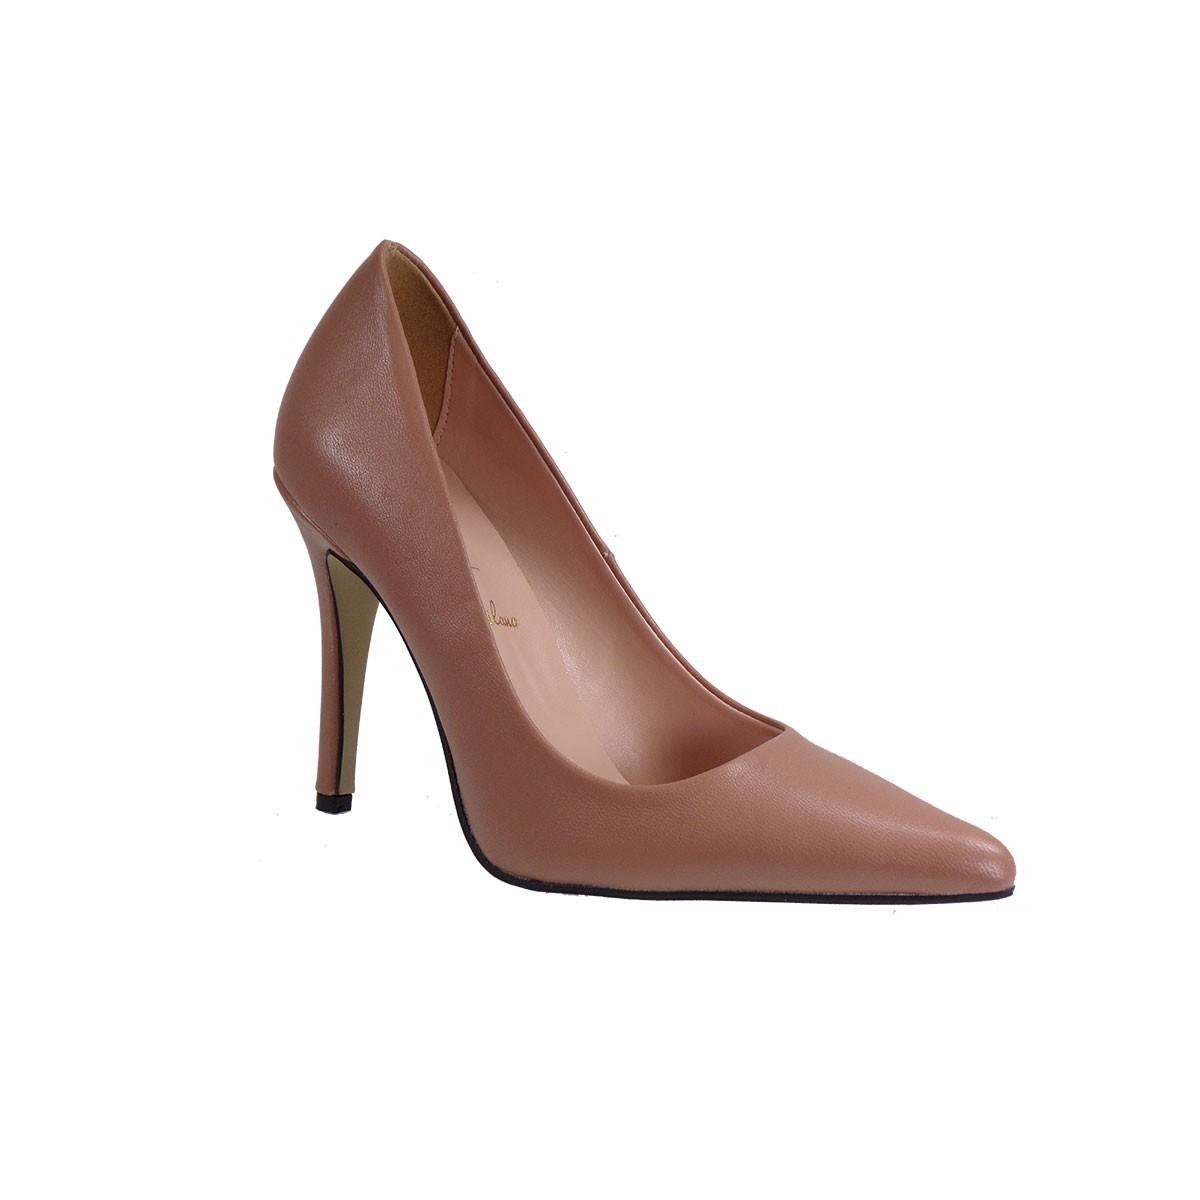 Alessandra Paggioti Γυναικεία Παπούτσια Γόβες 89001-Χ Nude Δέρμα